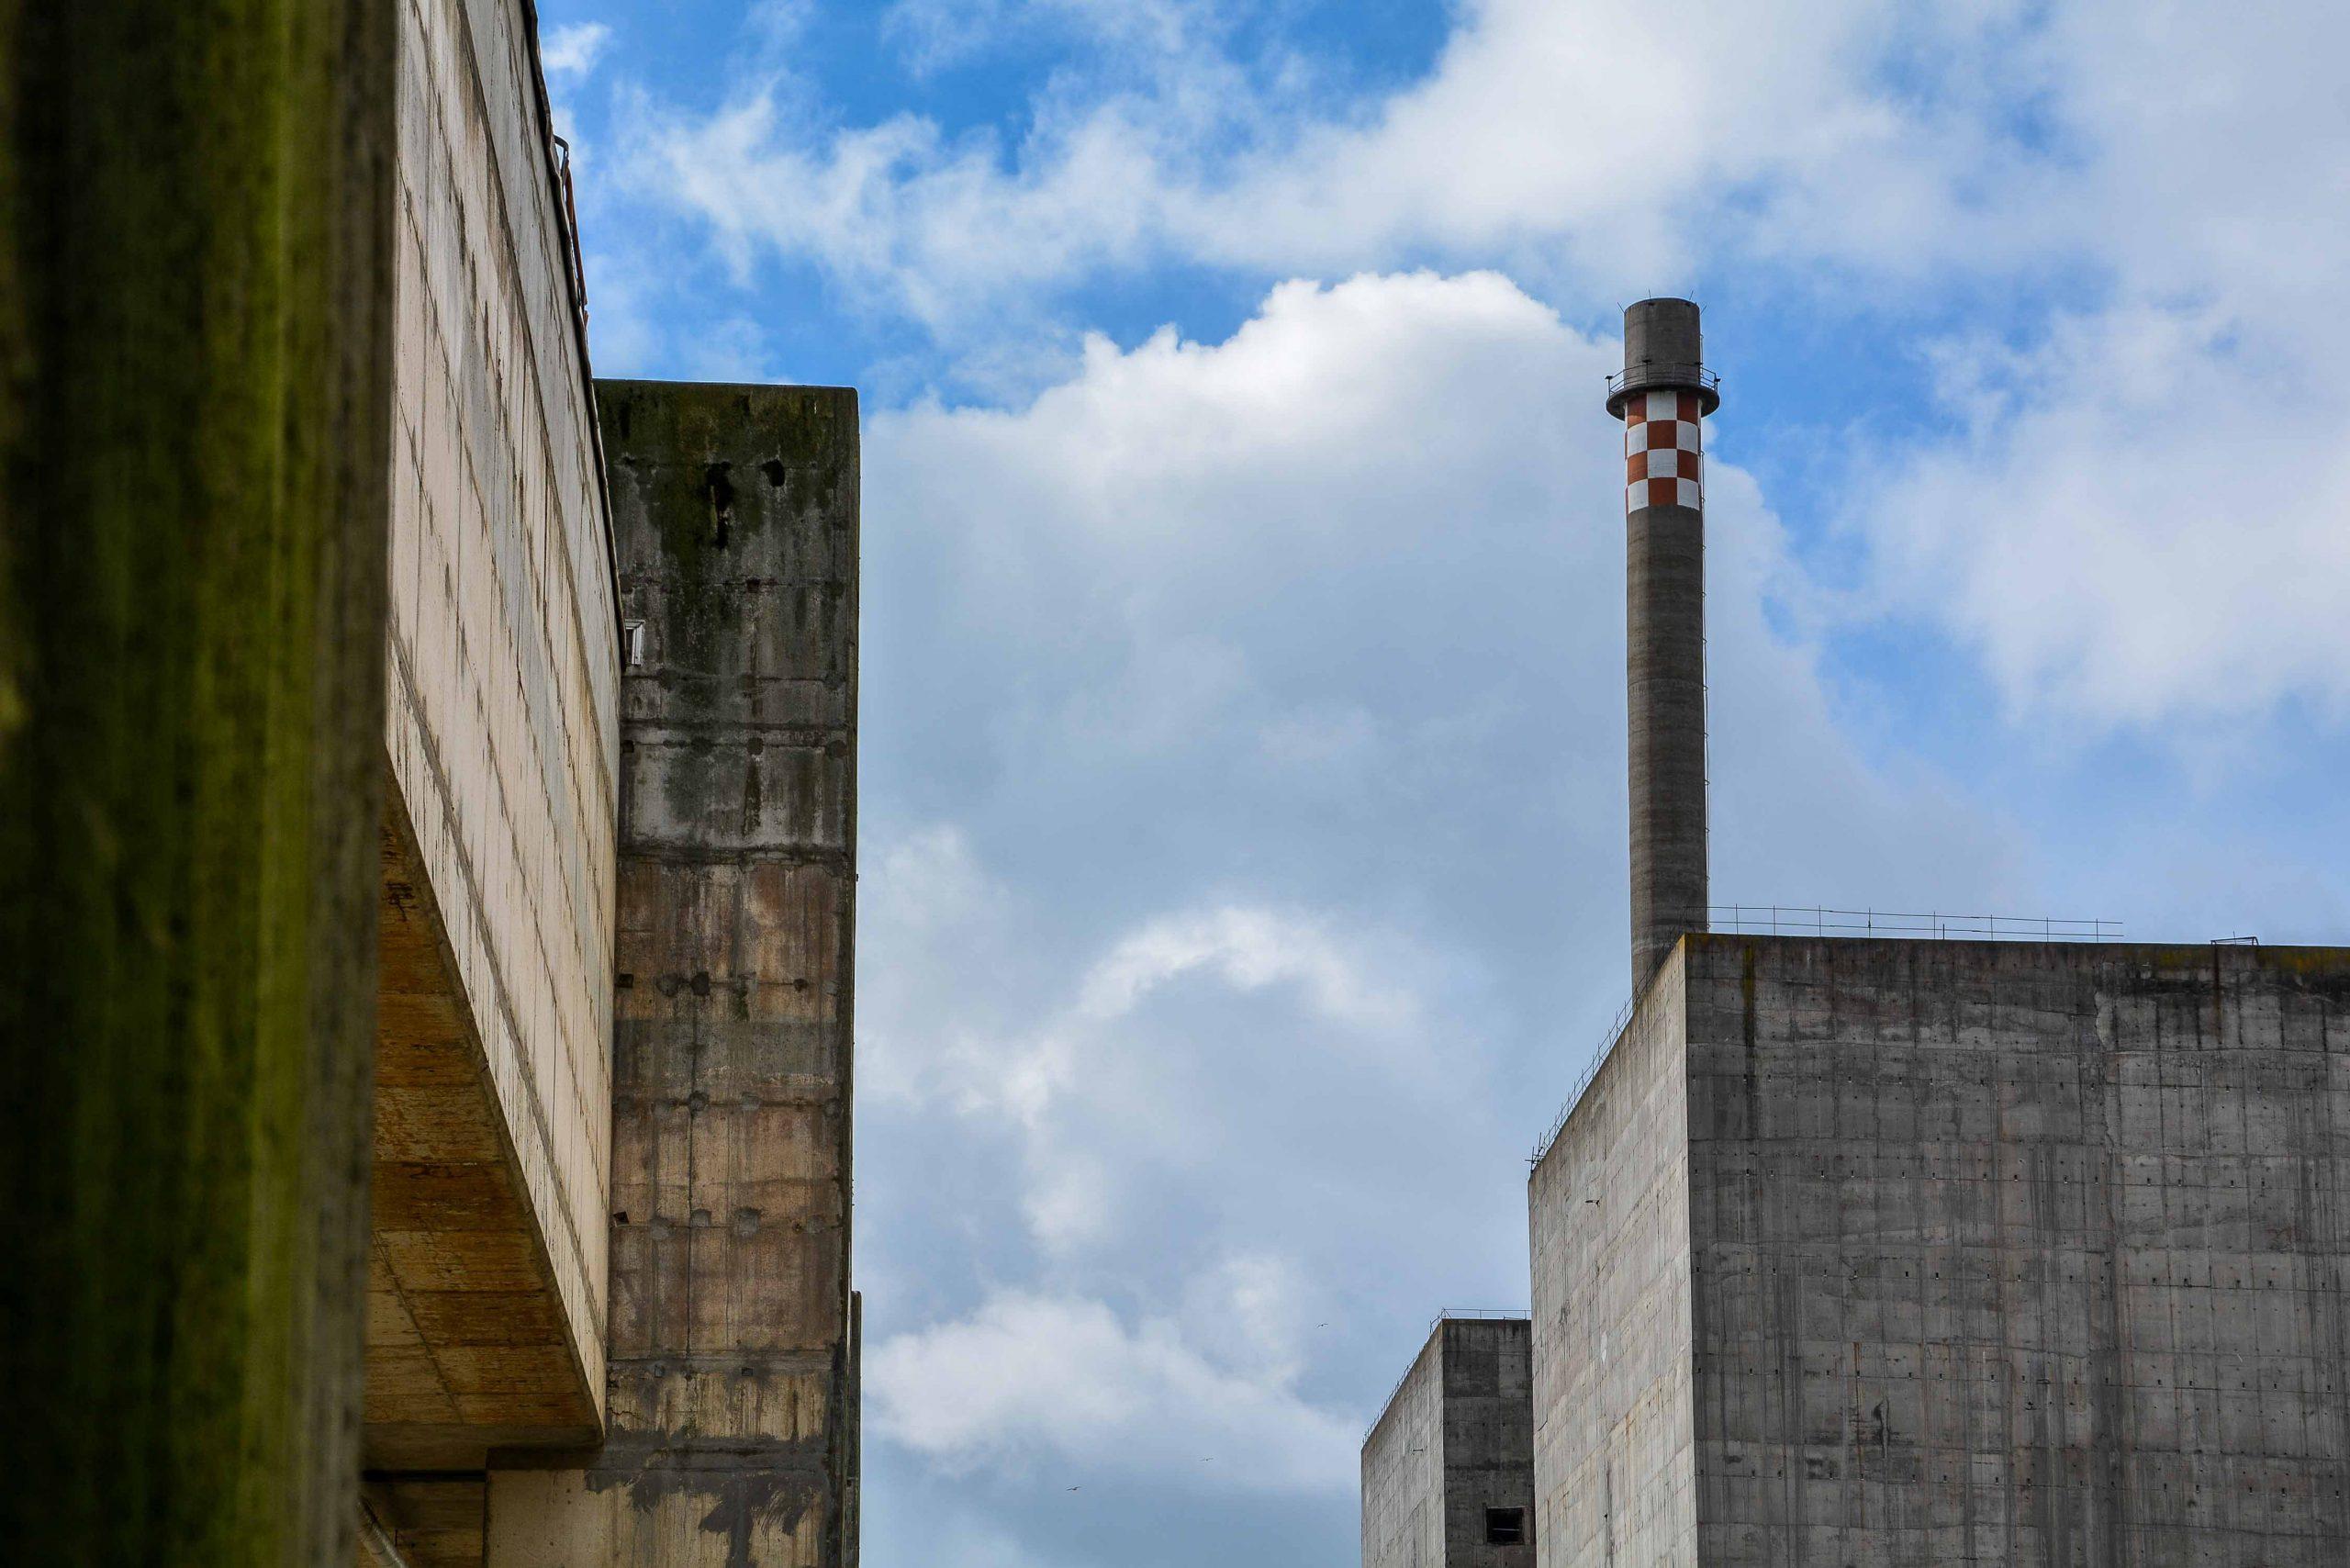 reaktor block gebaeude kernkraftwerk greifswald nuclear powerplant ost deutschland east germany gdr DDR mecklenburg vorpommern